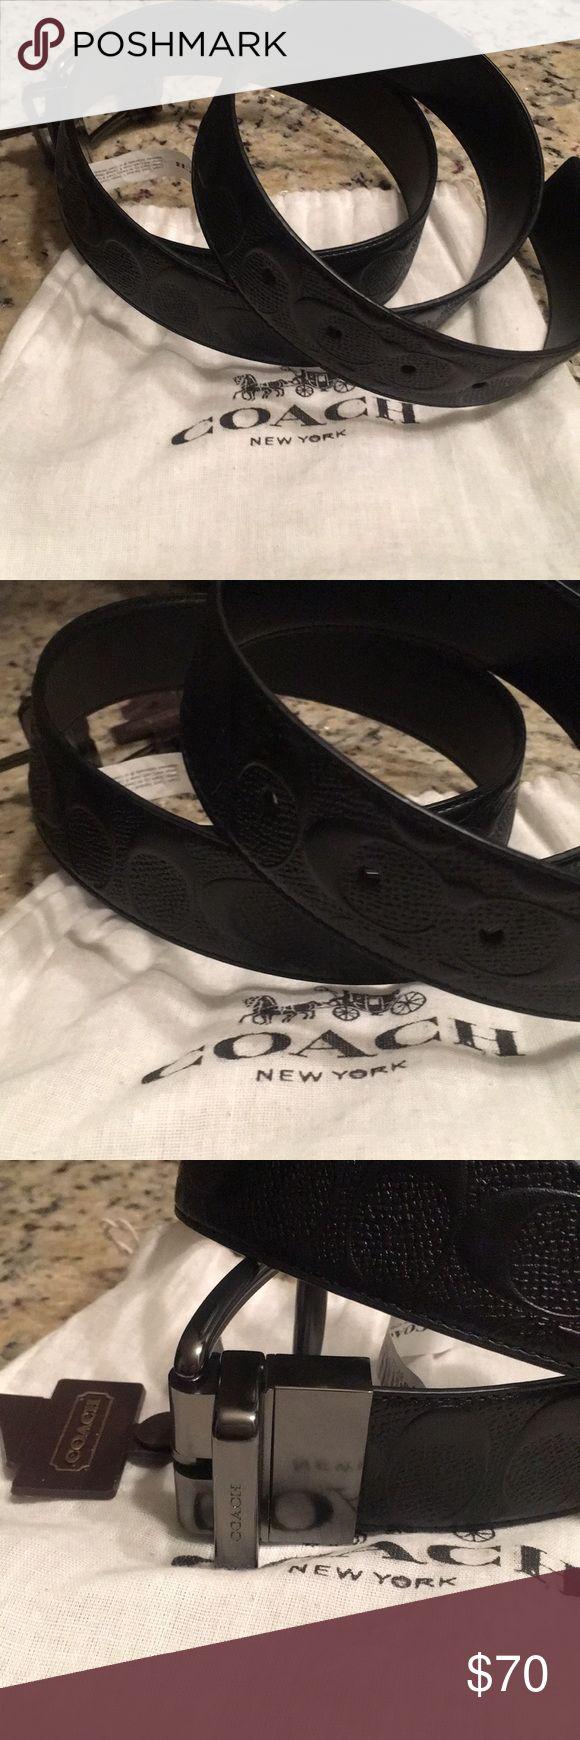 New black men's Coach belt OS New black men's Coach belt OS Coach Accessories Belts